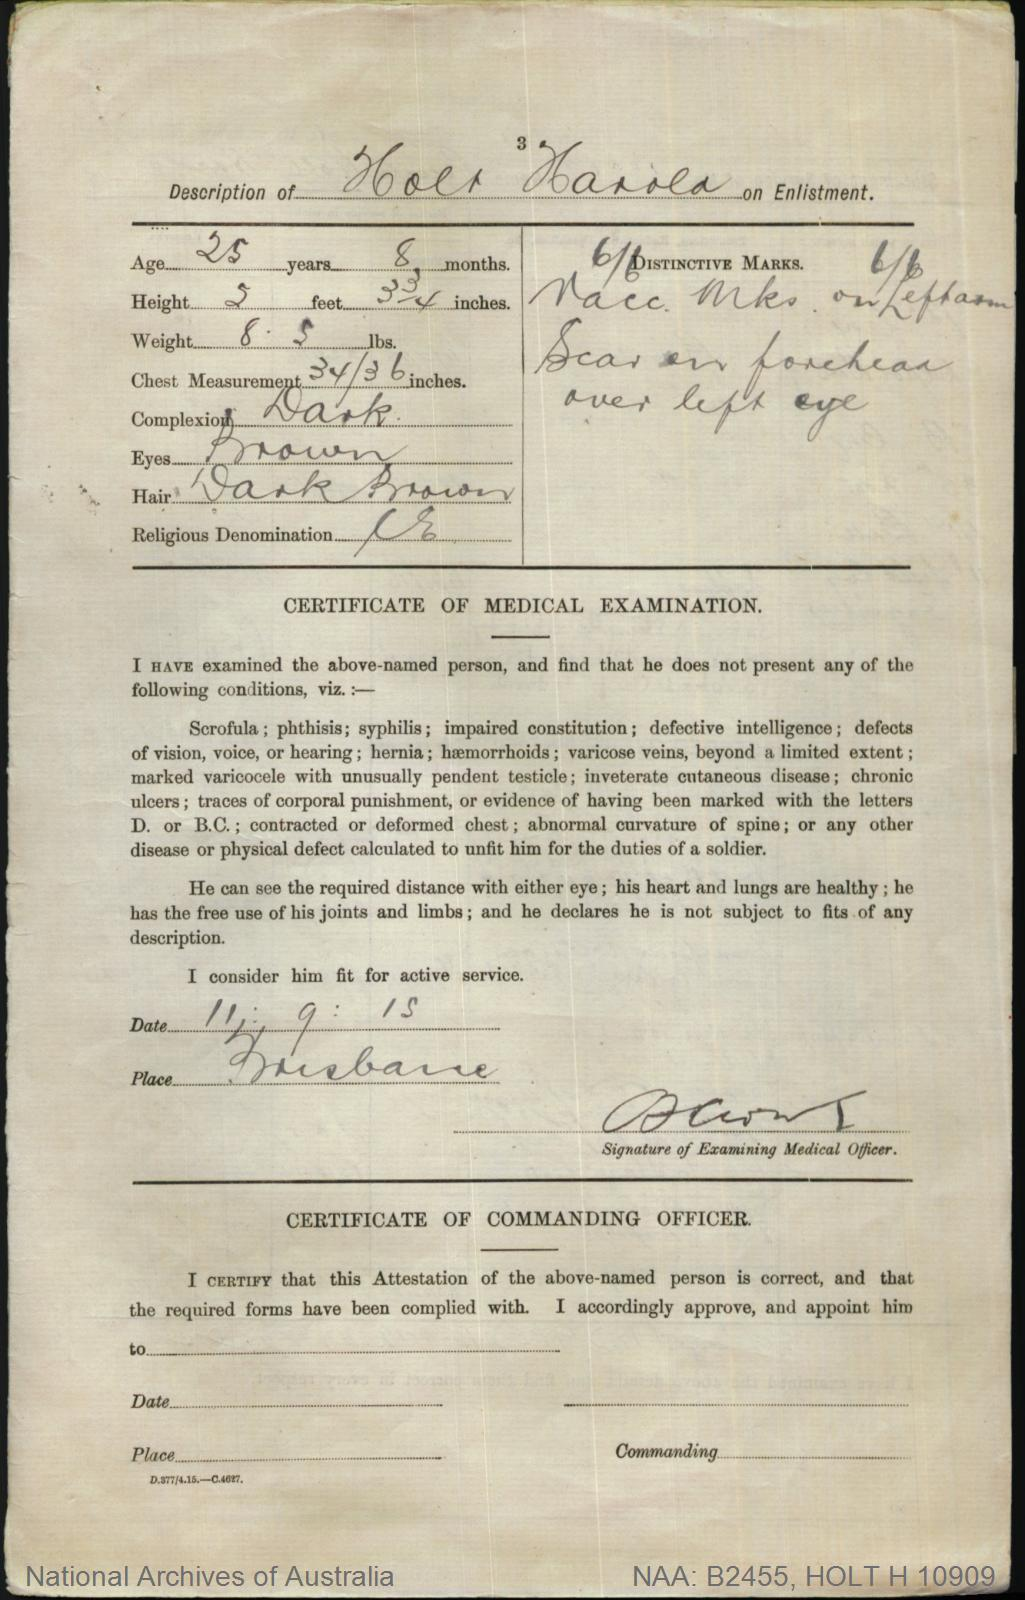 HOLT Harold : Service Number - 10909 : Place of Birth - London England : Place of Enlistment - Brisbane Qld : Next of Kin - (Mother) HOLT Elizabeth